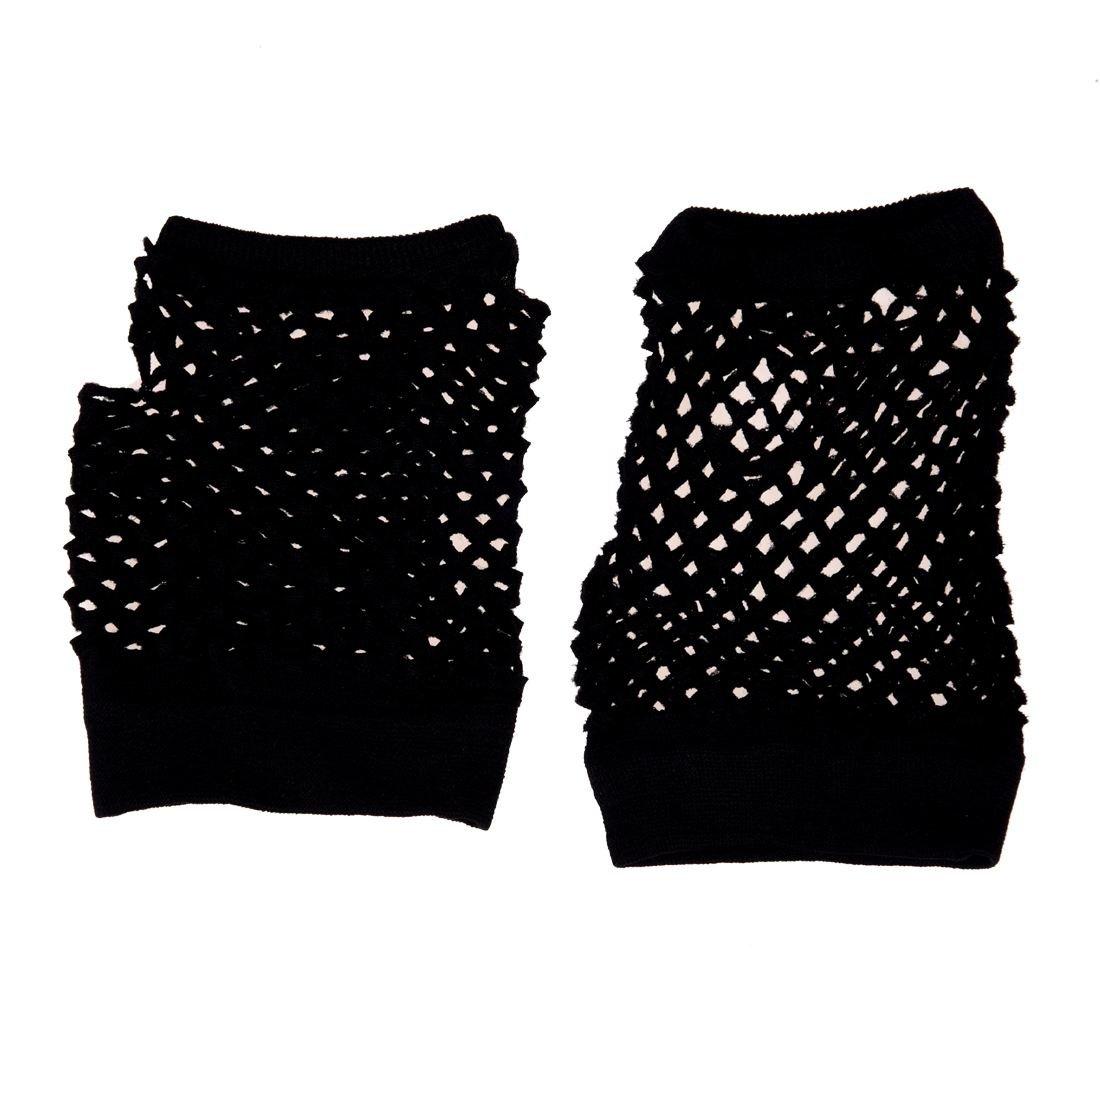 TOOGOO(R) 2 pezzi elastico brevi Fish Net guanti senza dita Guanti nero per le signore